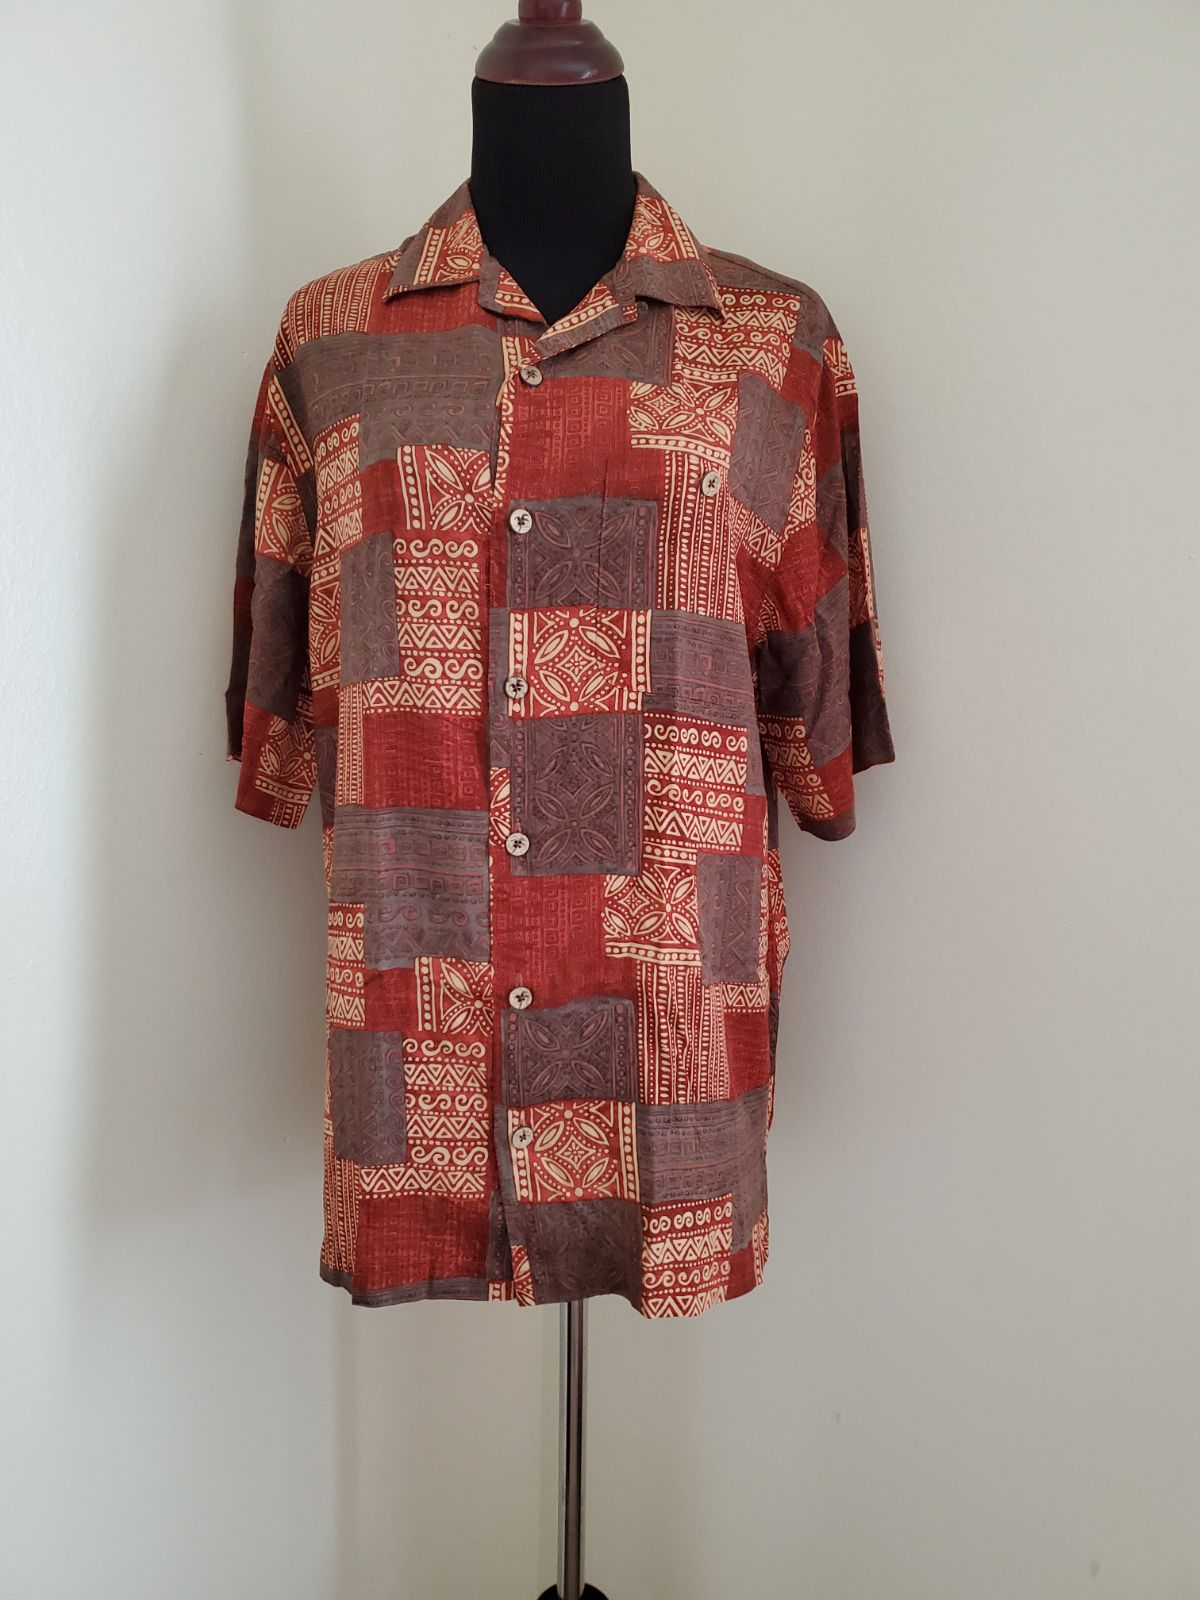 Caribbean Button Down S/S Shirt